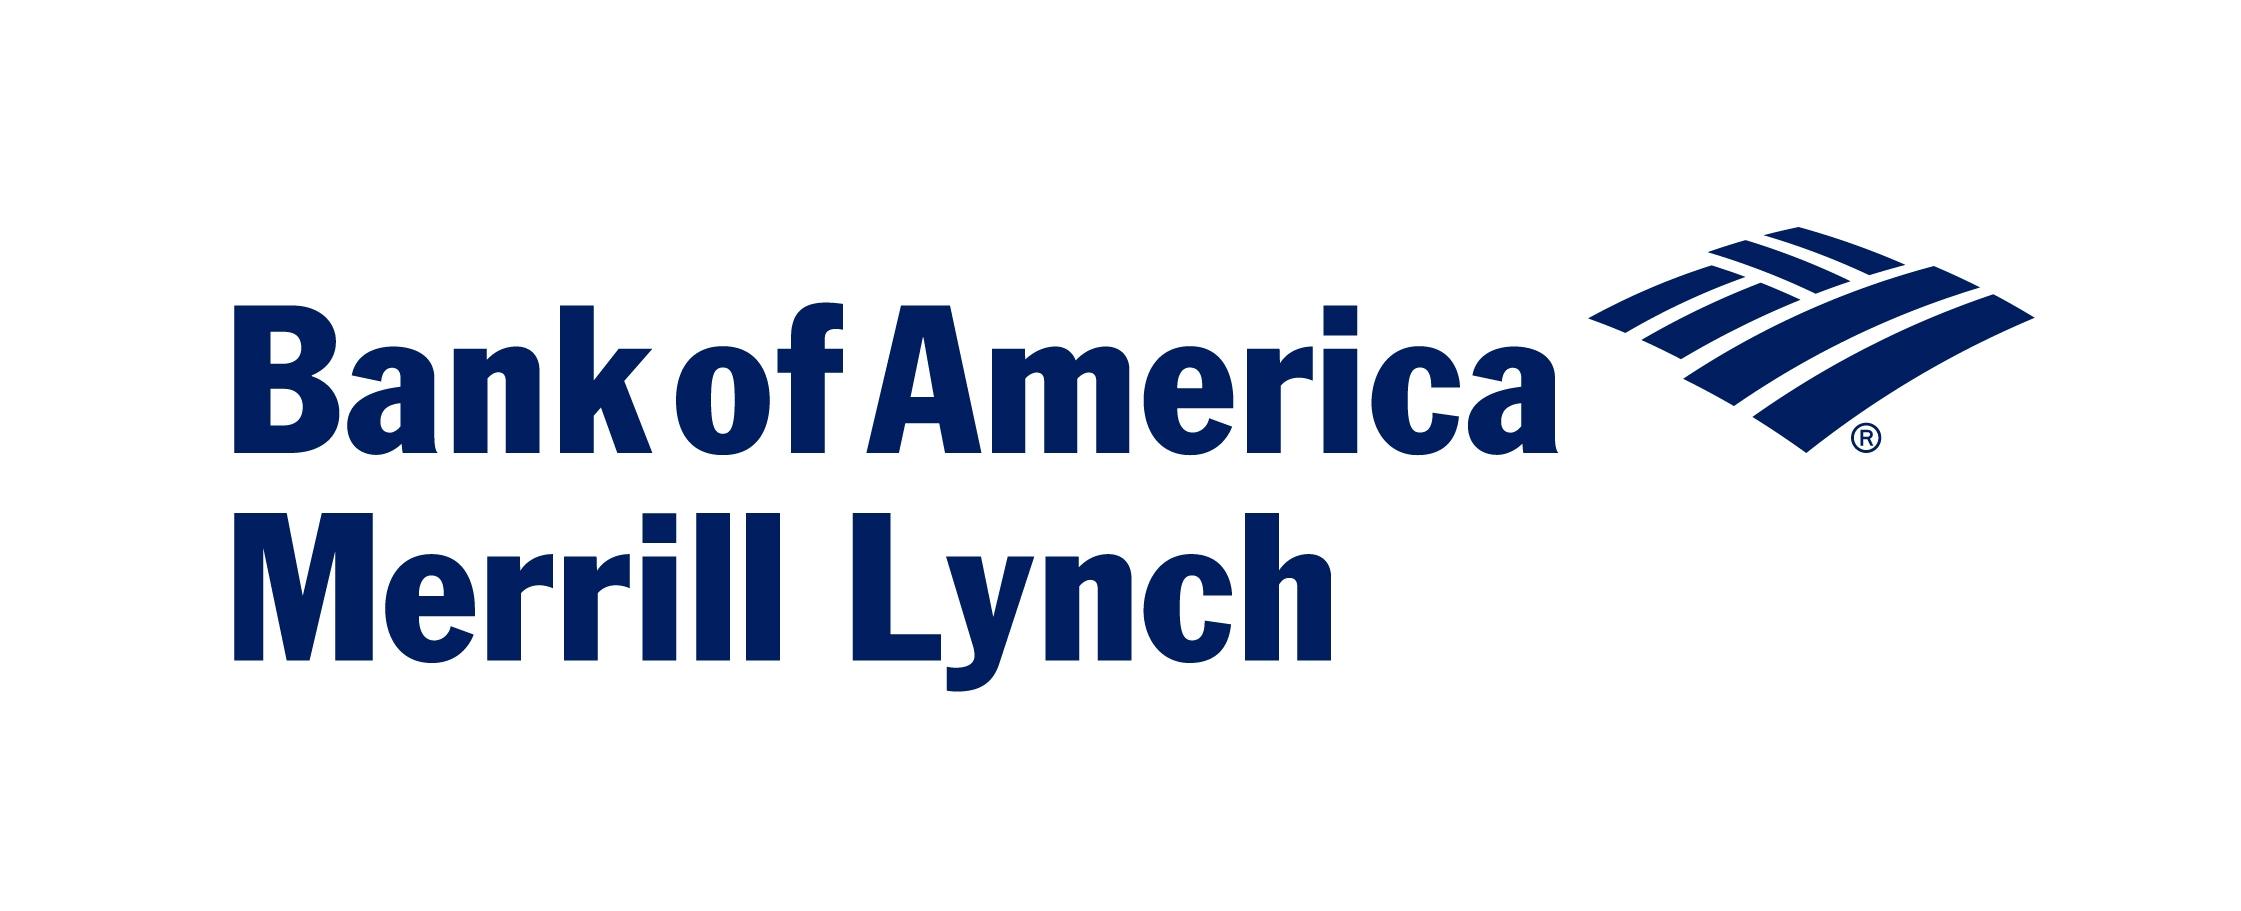 Bank_of_America_Merrill_Lynch_RGB_300[1]